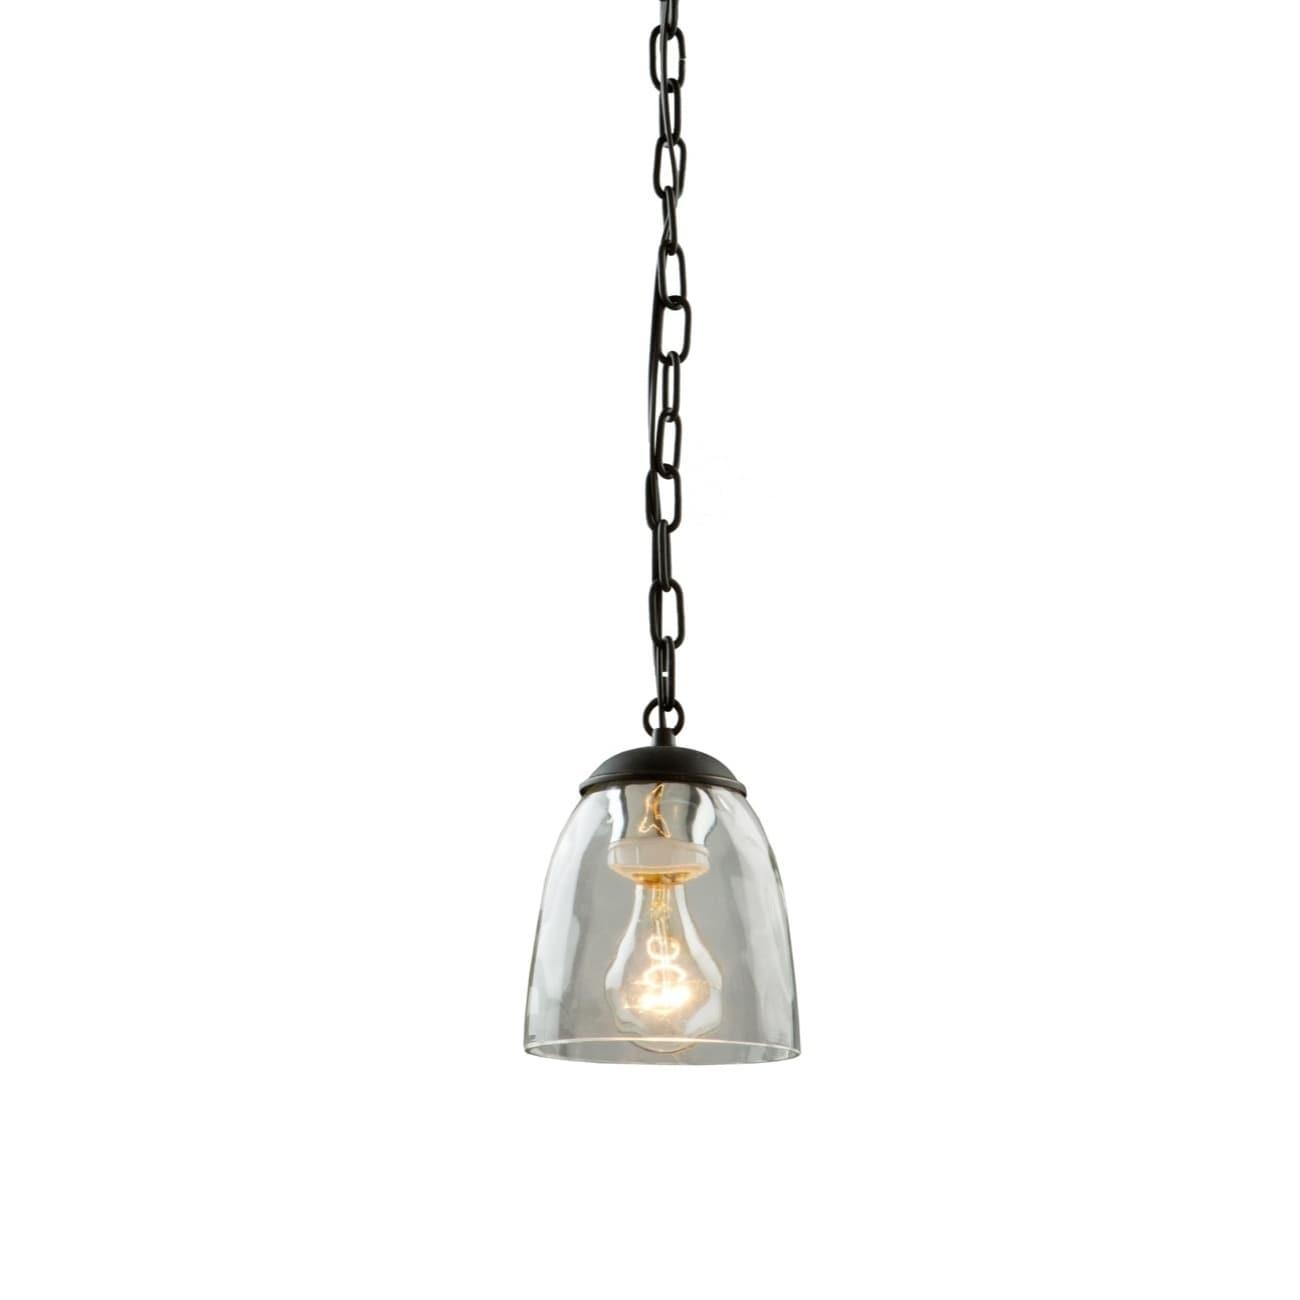 Shop artcraft lighting kent ac10220ob pendant free shipping on orders over 45 overstock 21013941